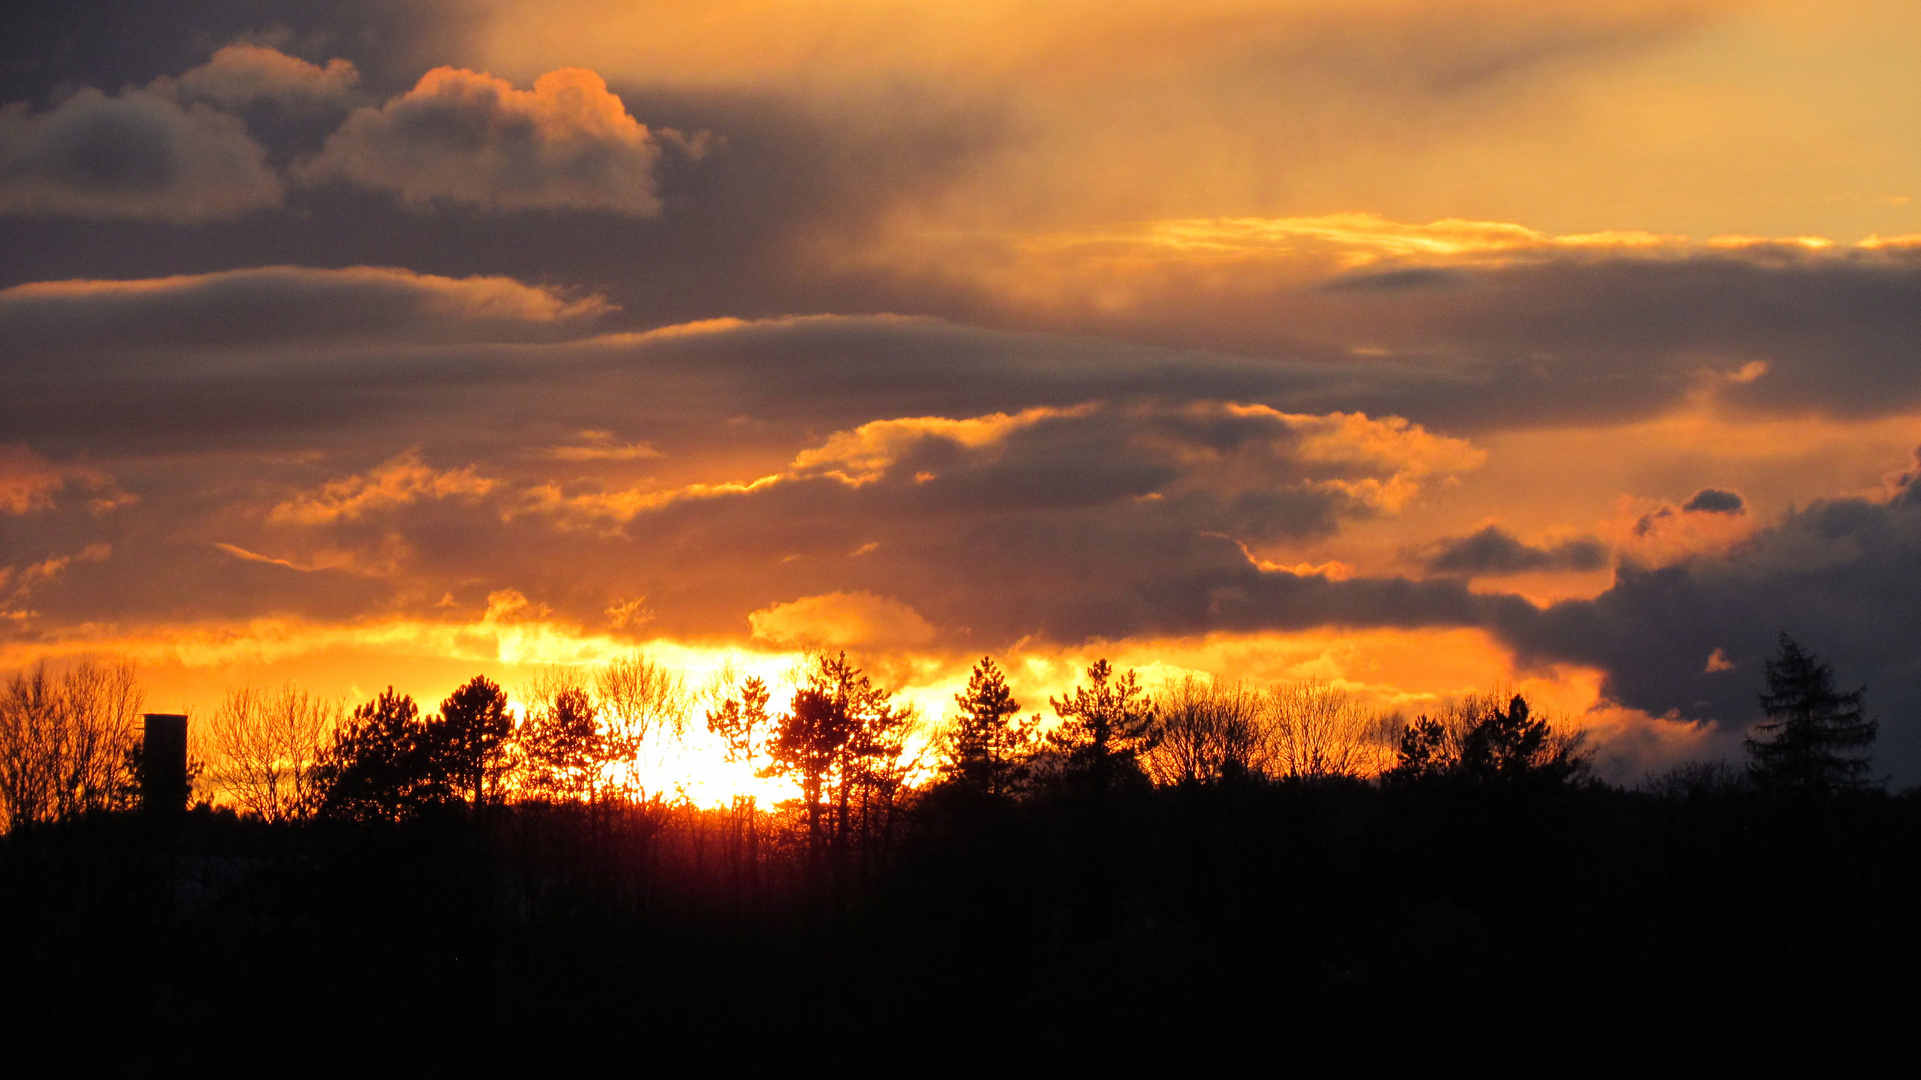 Sonnenuntergang bei Burghausen